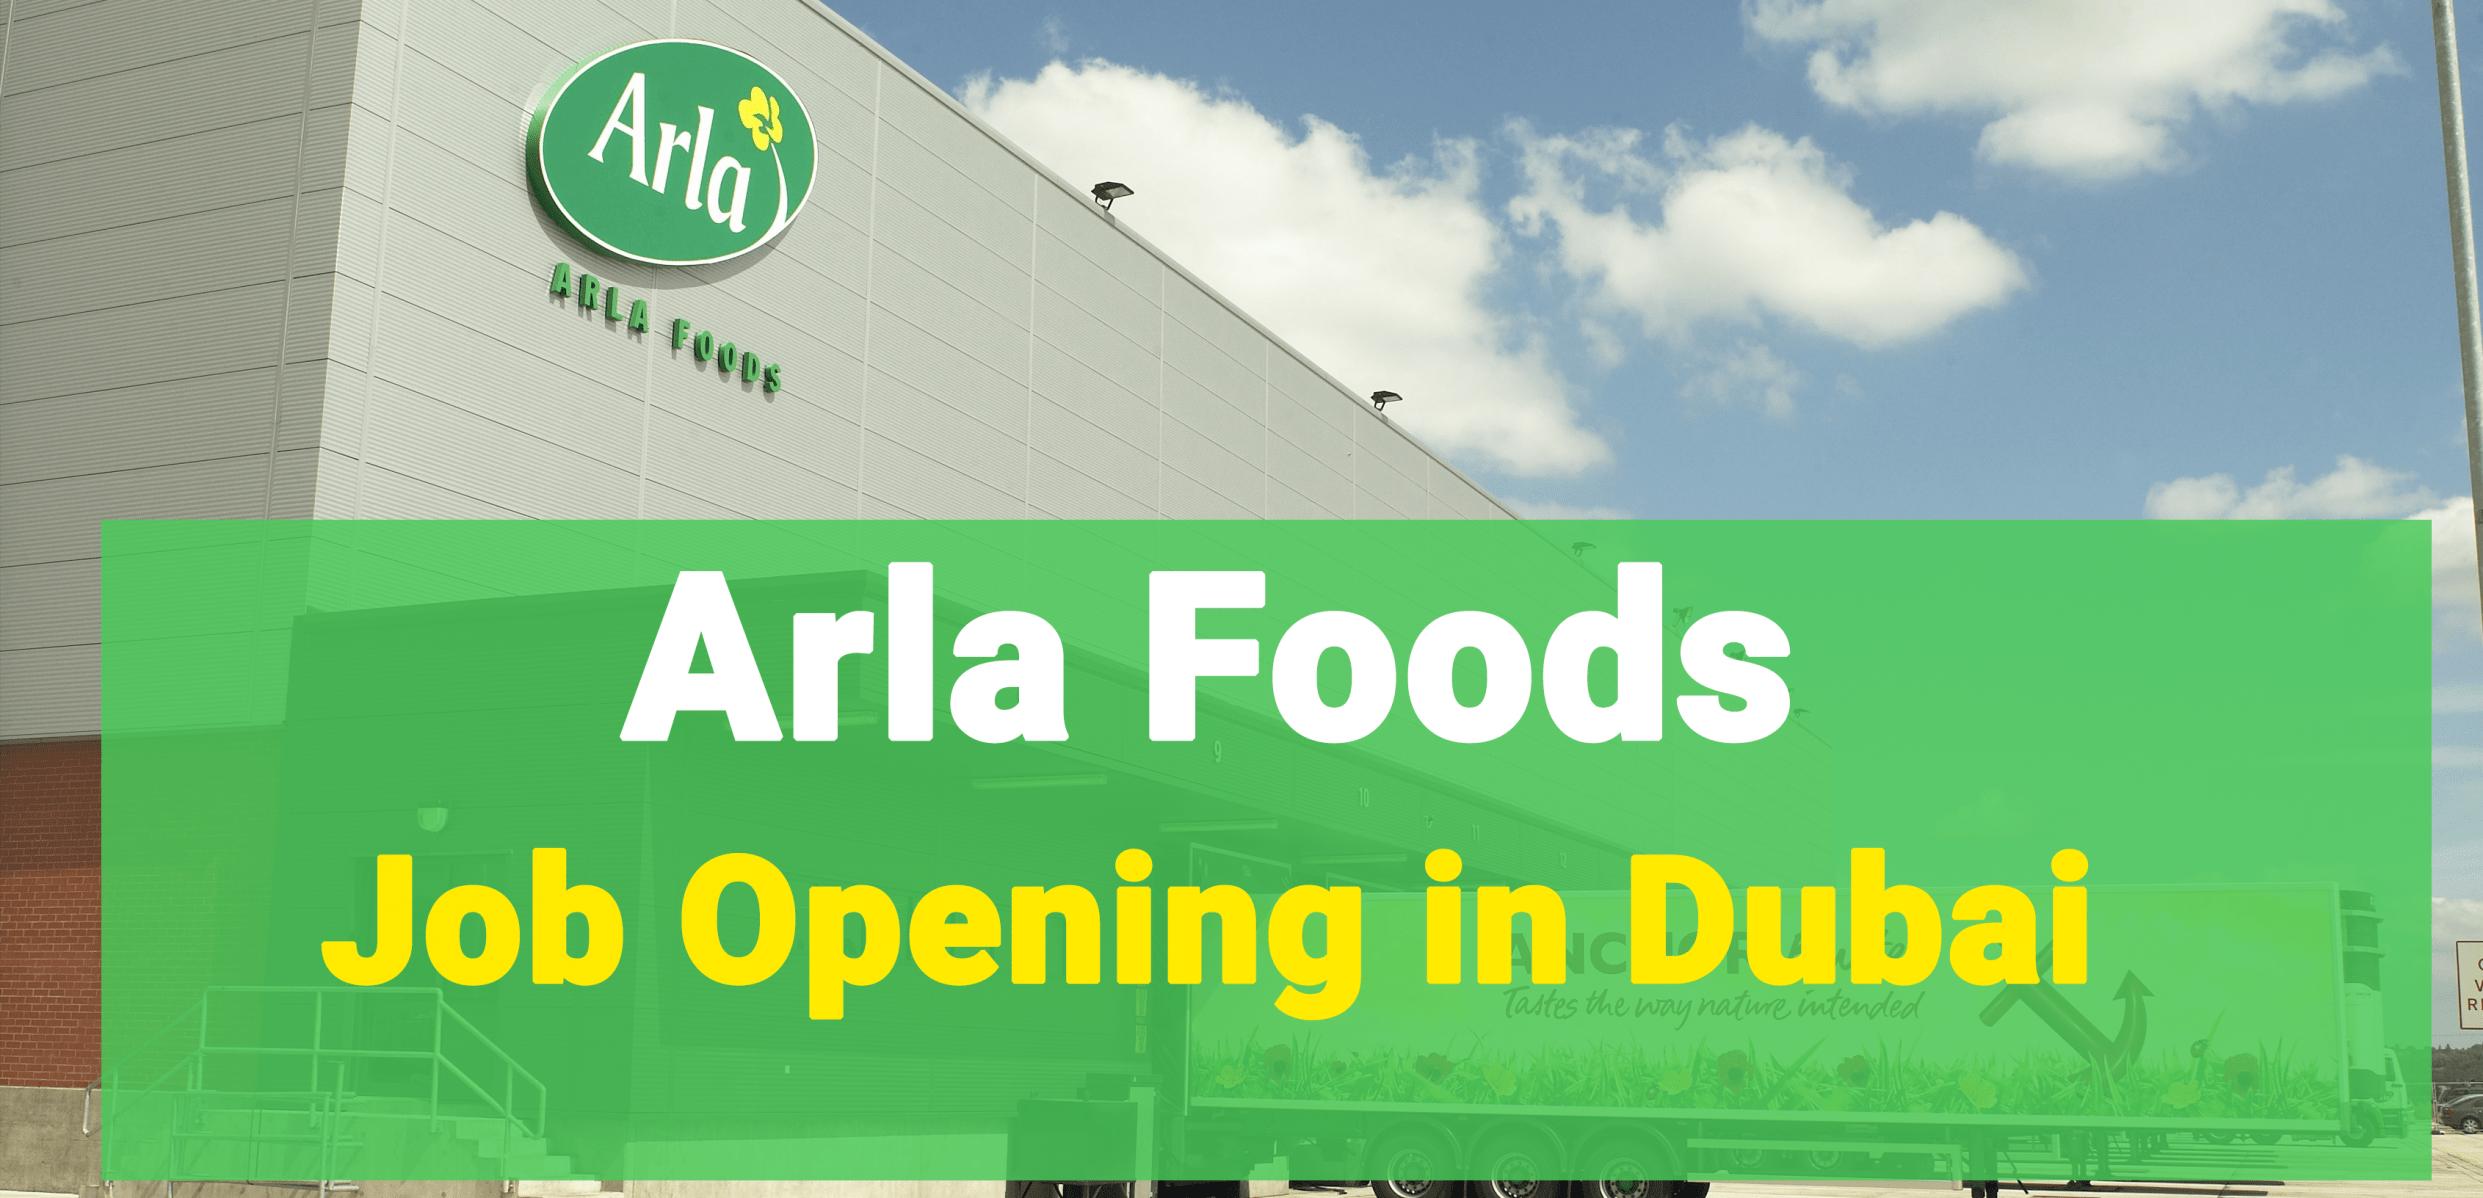 Arla Food Jobs in Dubai 2021